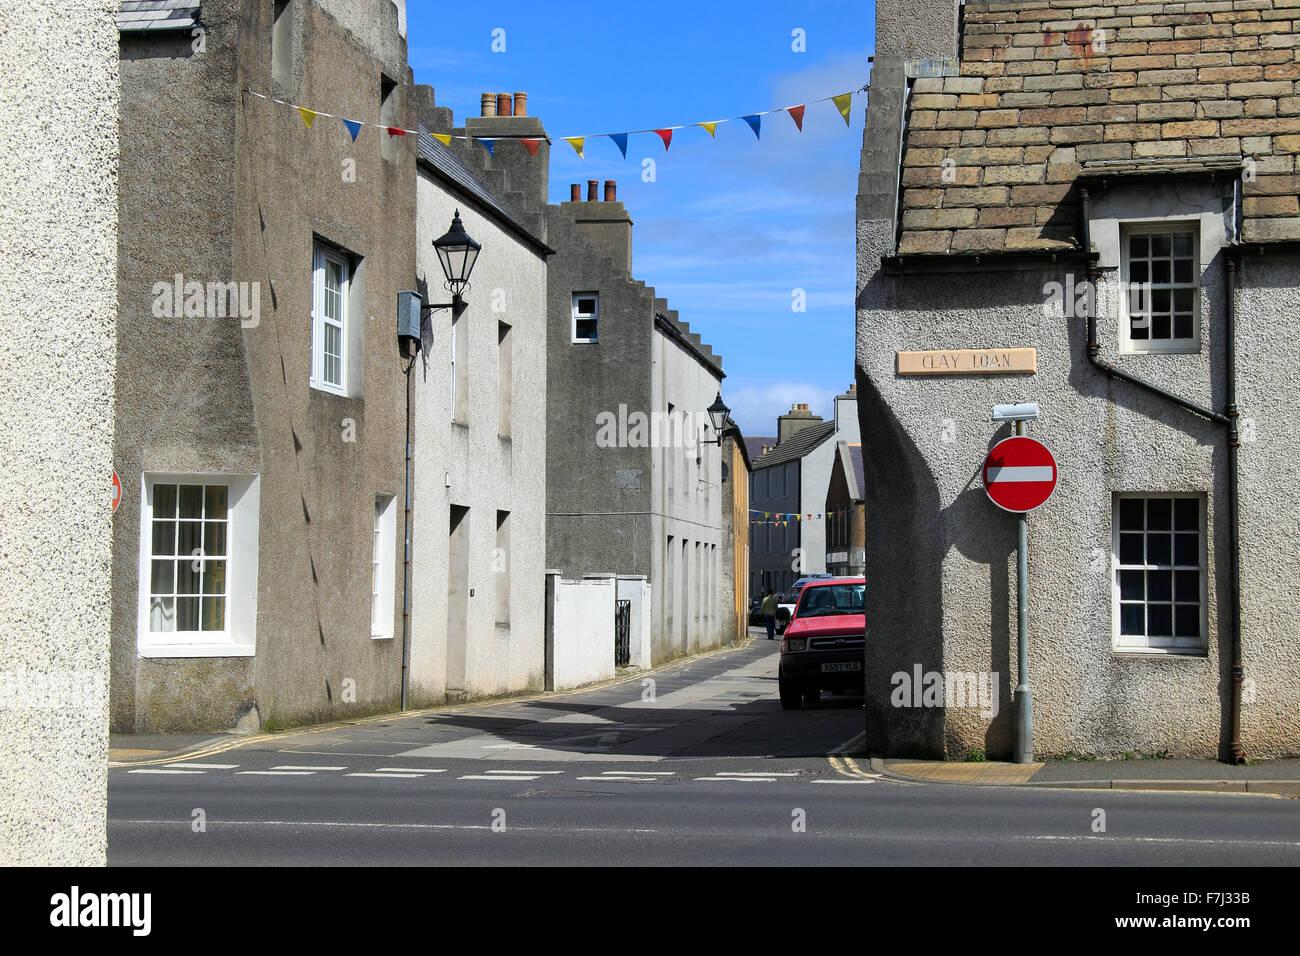 Clay Loan and Union Street looking towards Victoria Street Kirkwall Orkney Islands Scotland UK - Stock Image